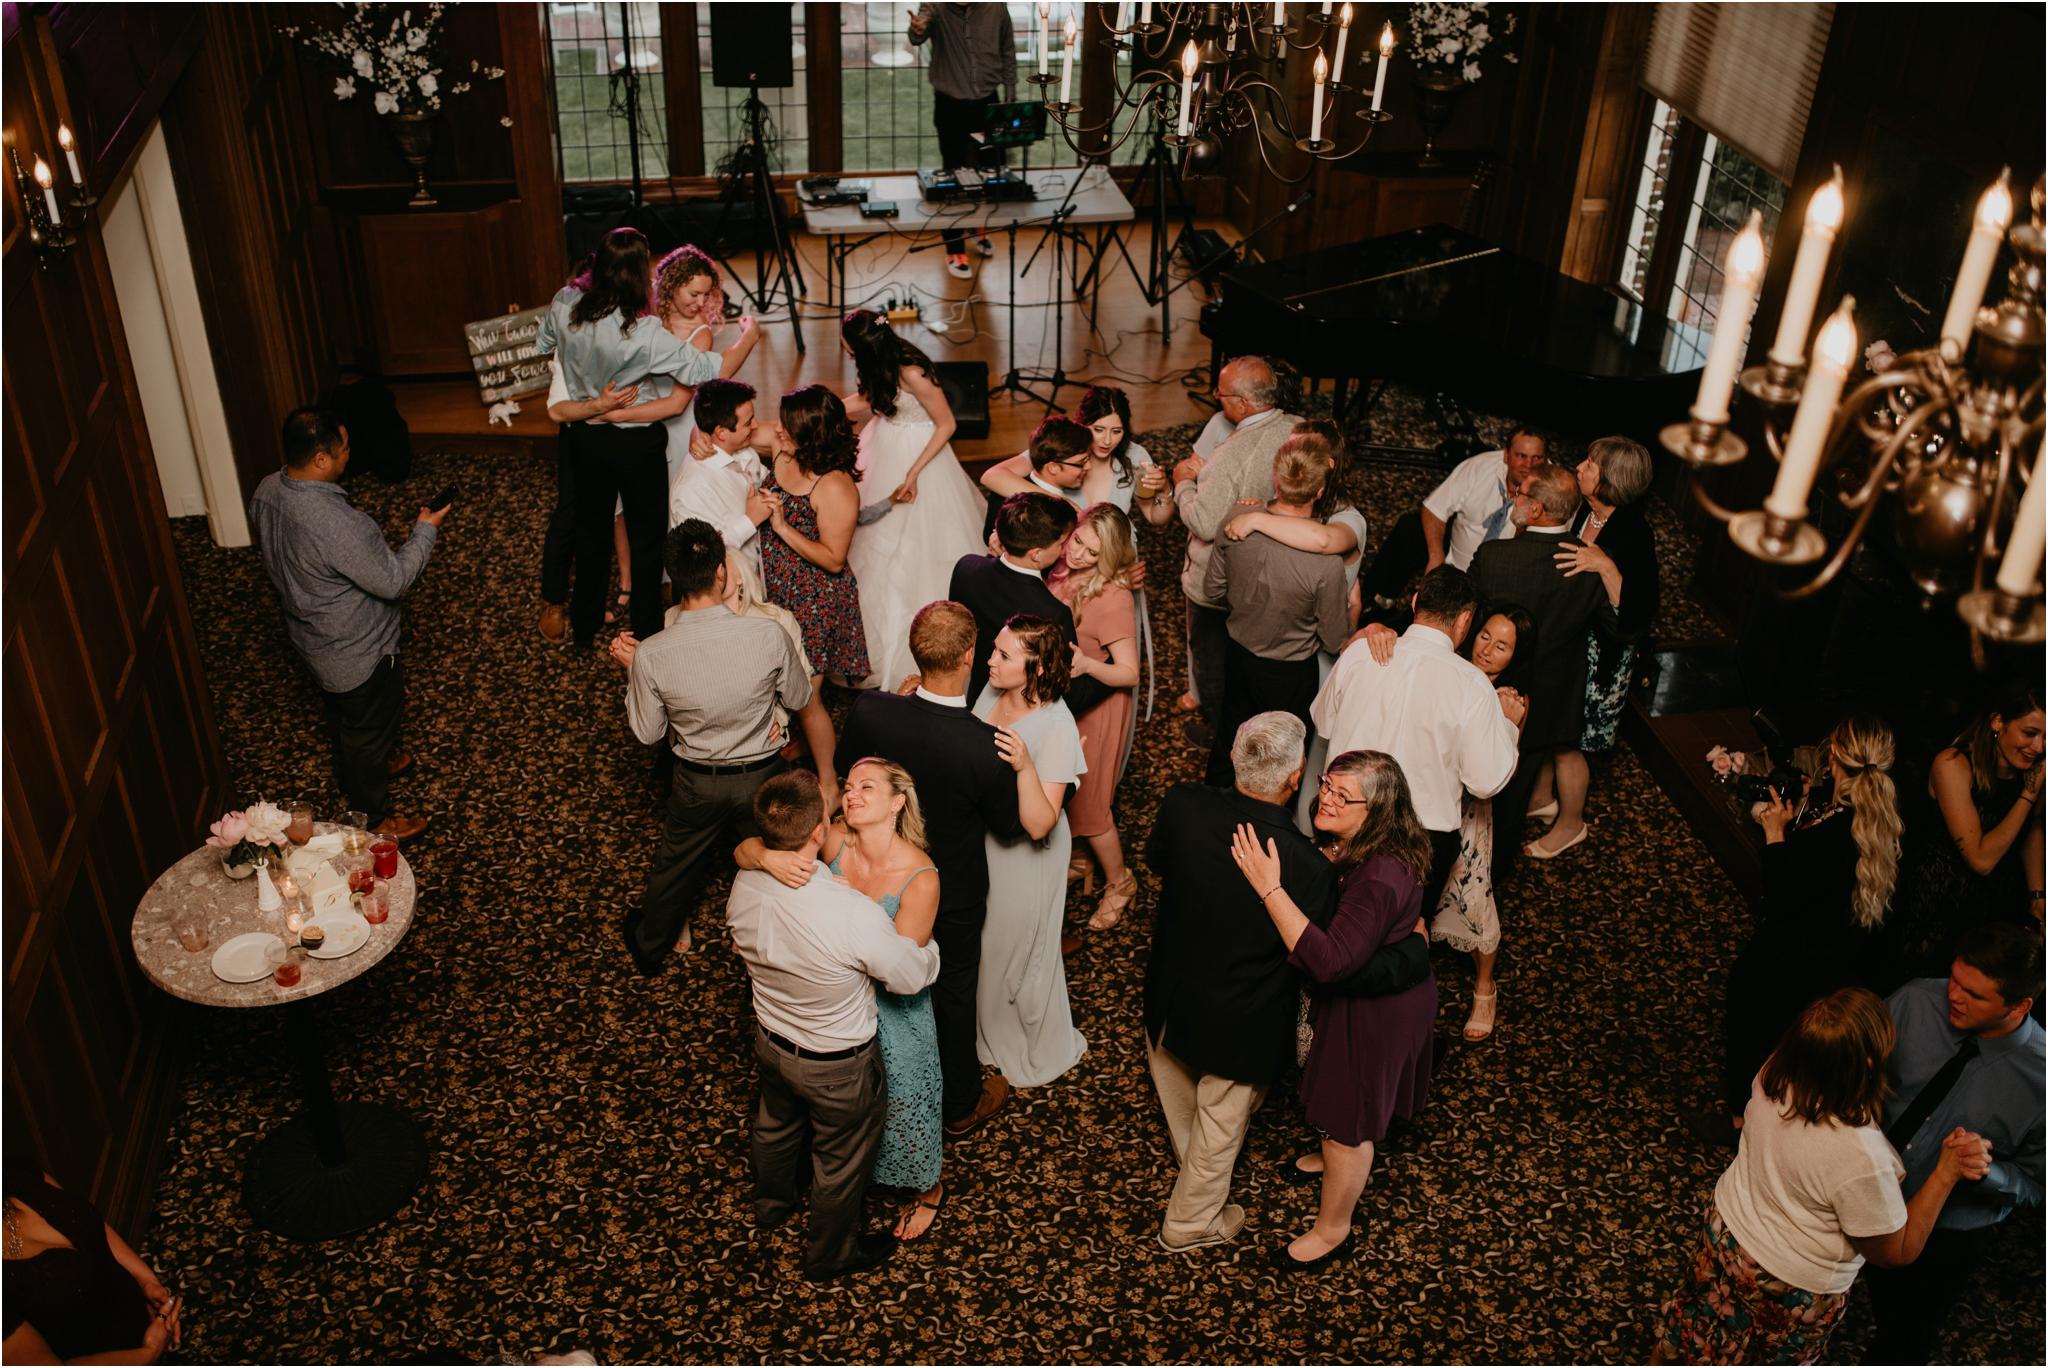 chance-and-ondrea-lairmont-manor-wedding-seattle-photographer-141.jpg